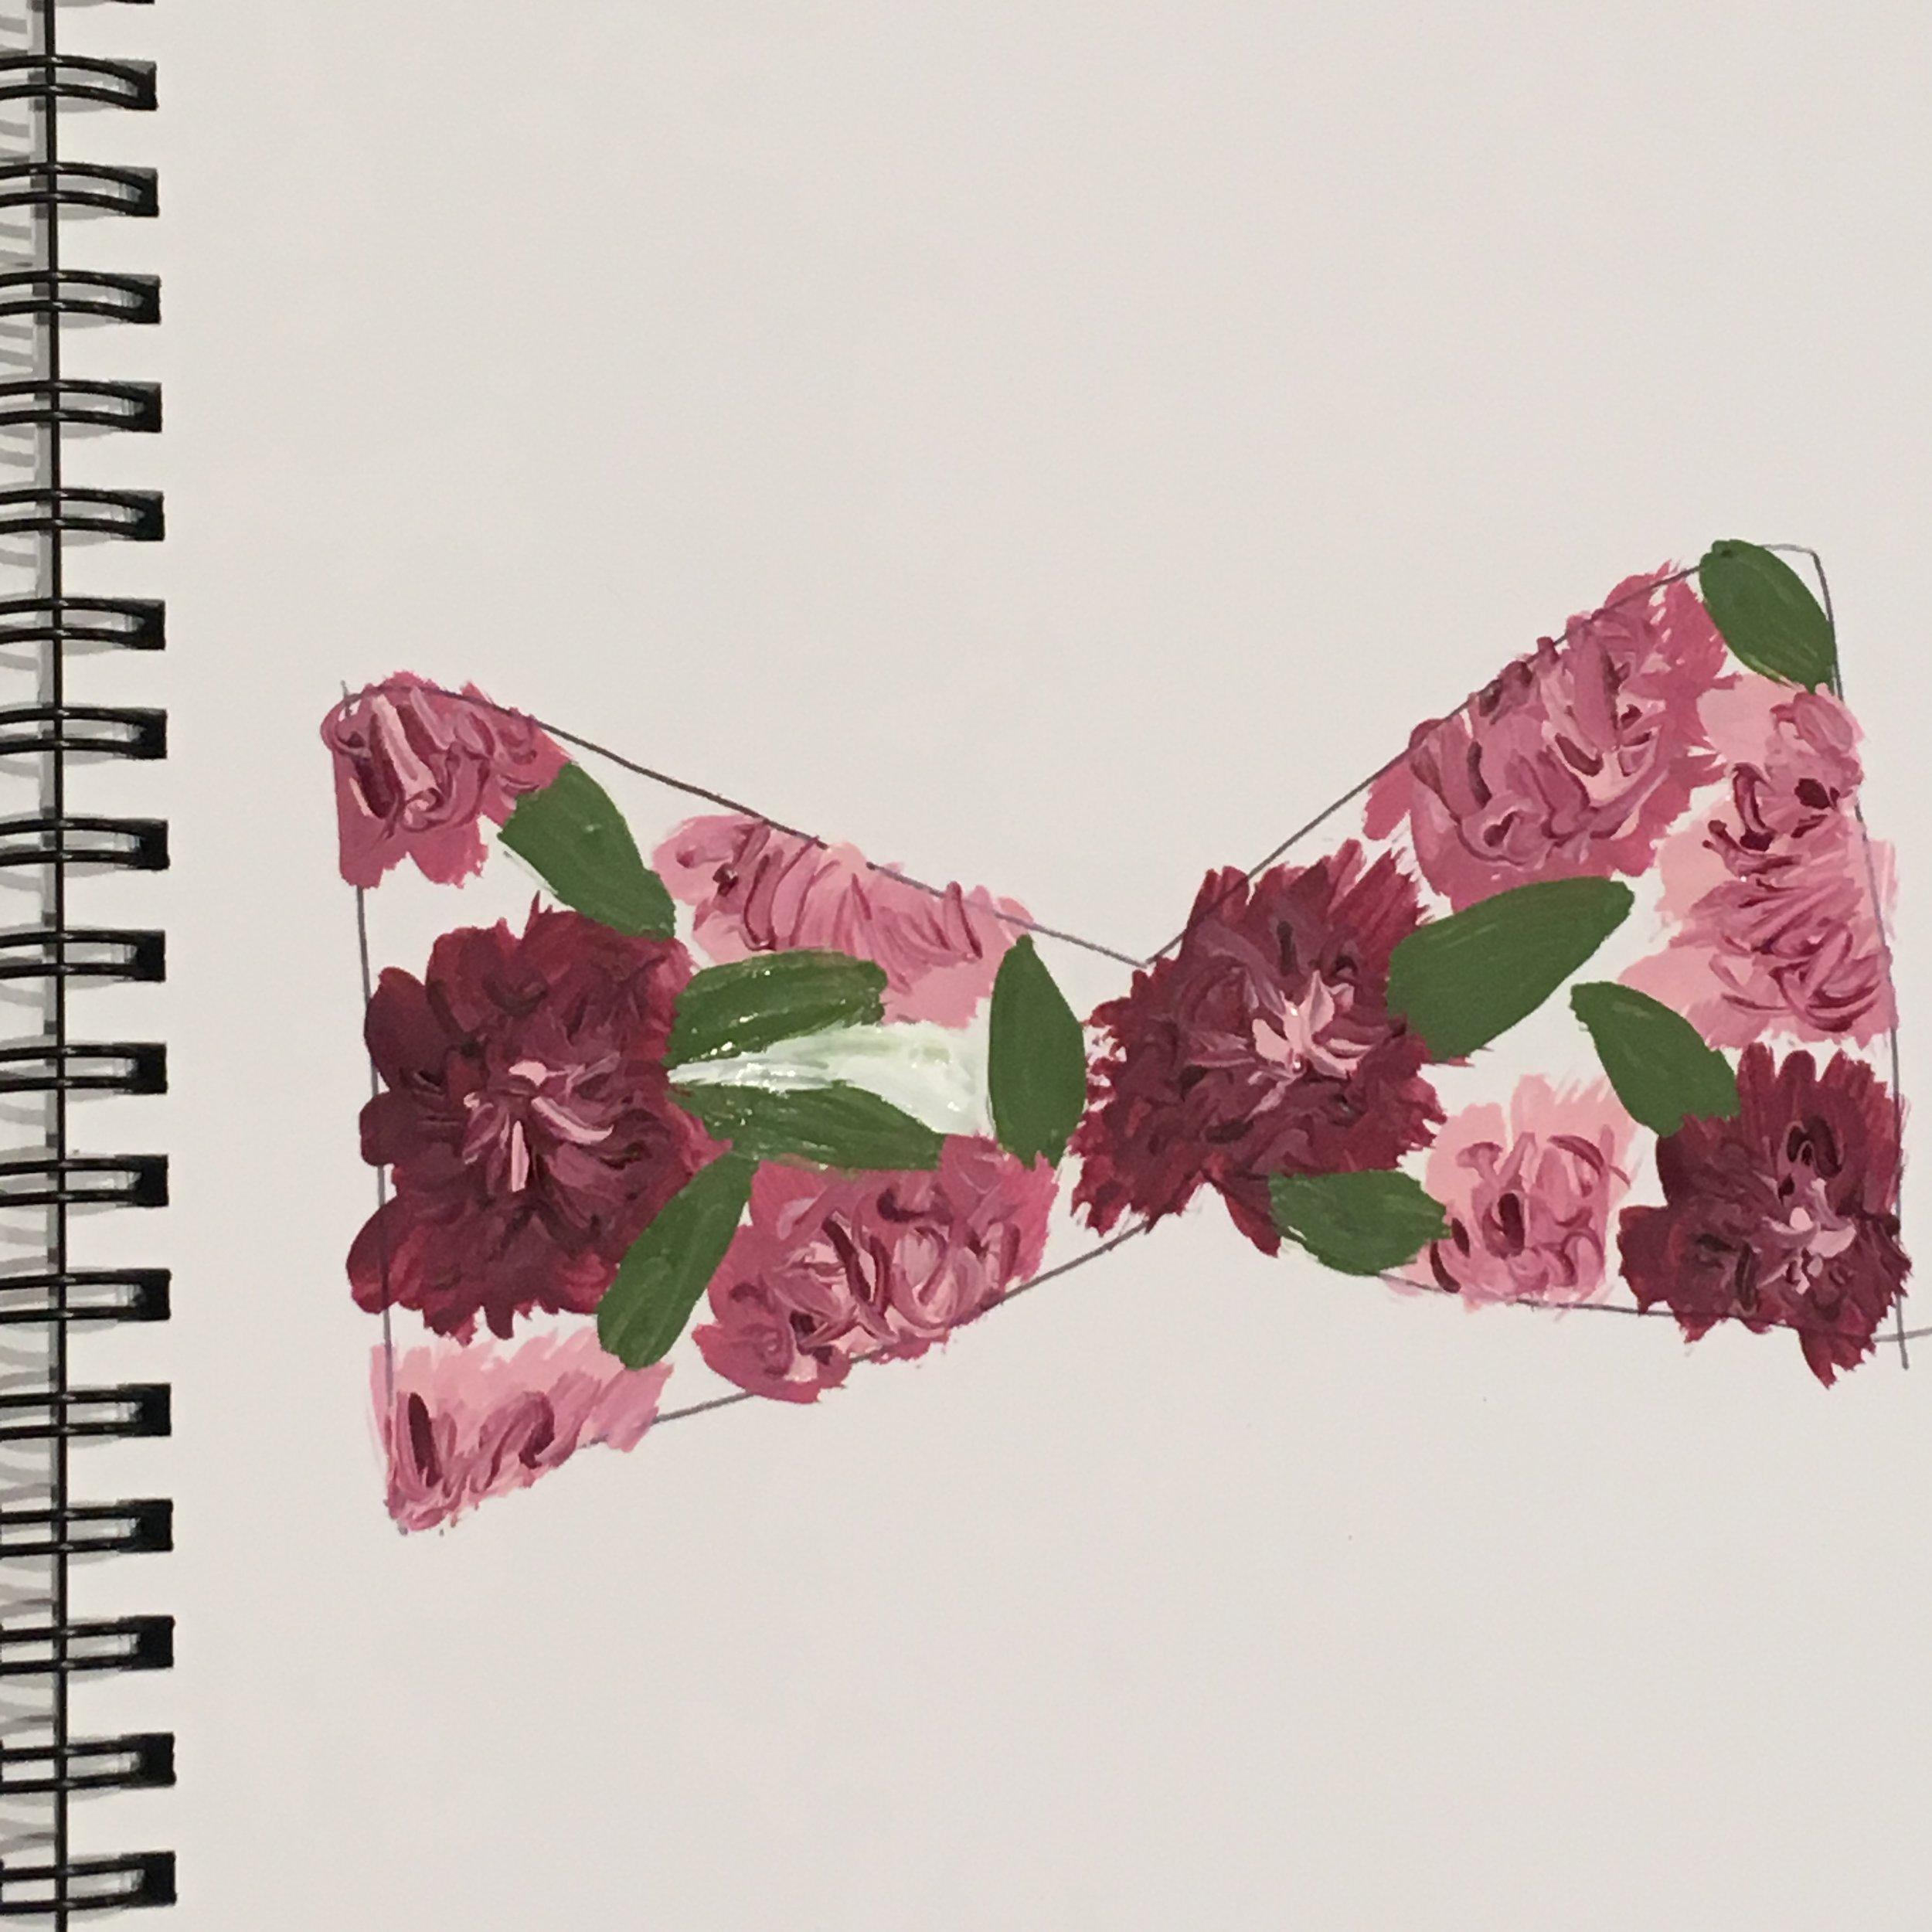 edward kwan hand painted bow ties 5.JPG